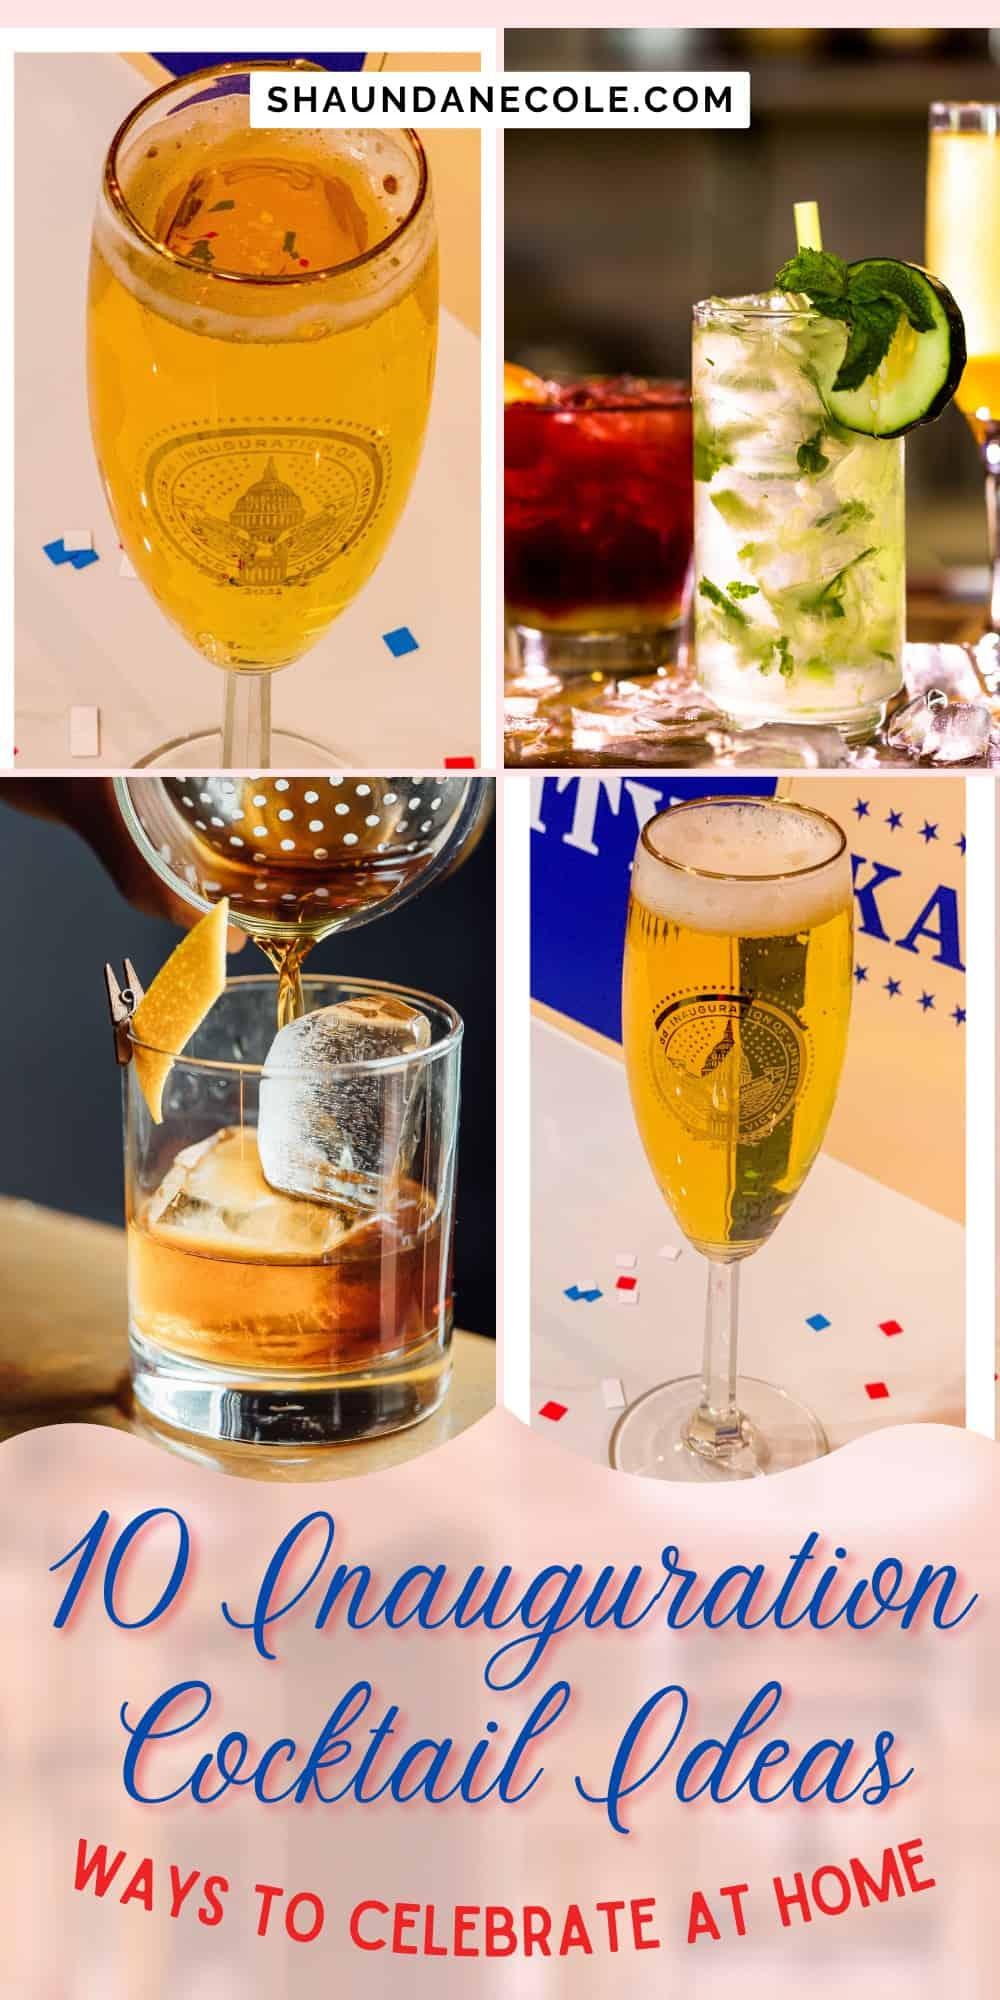 10 Inauguration Cocktails Ideas